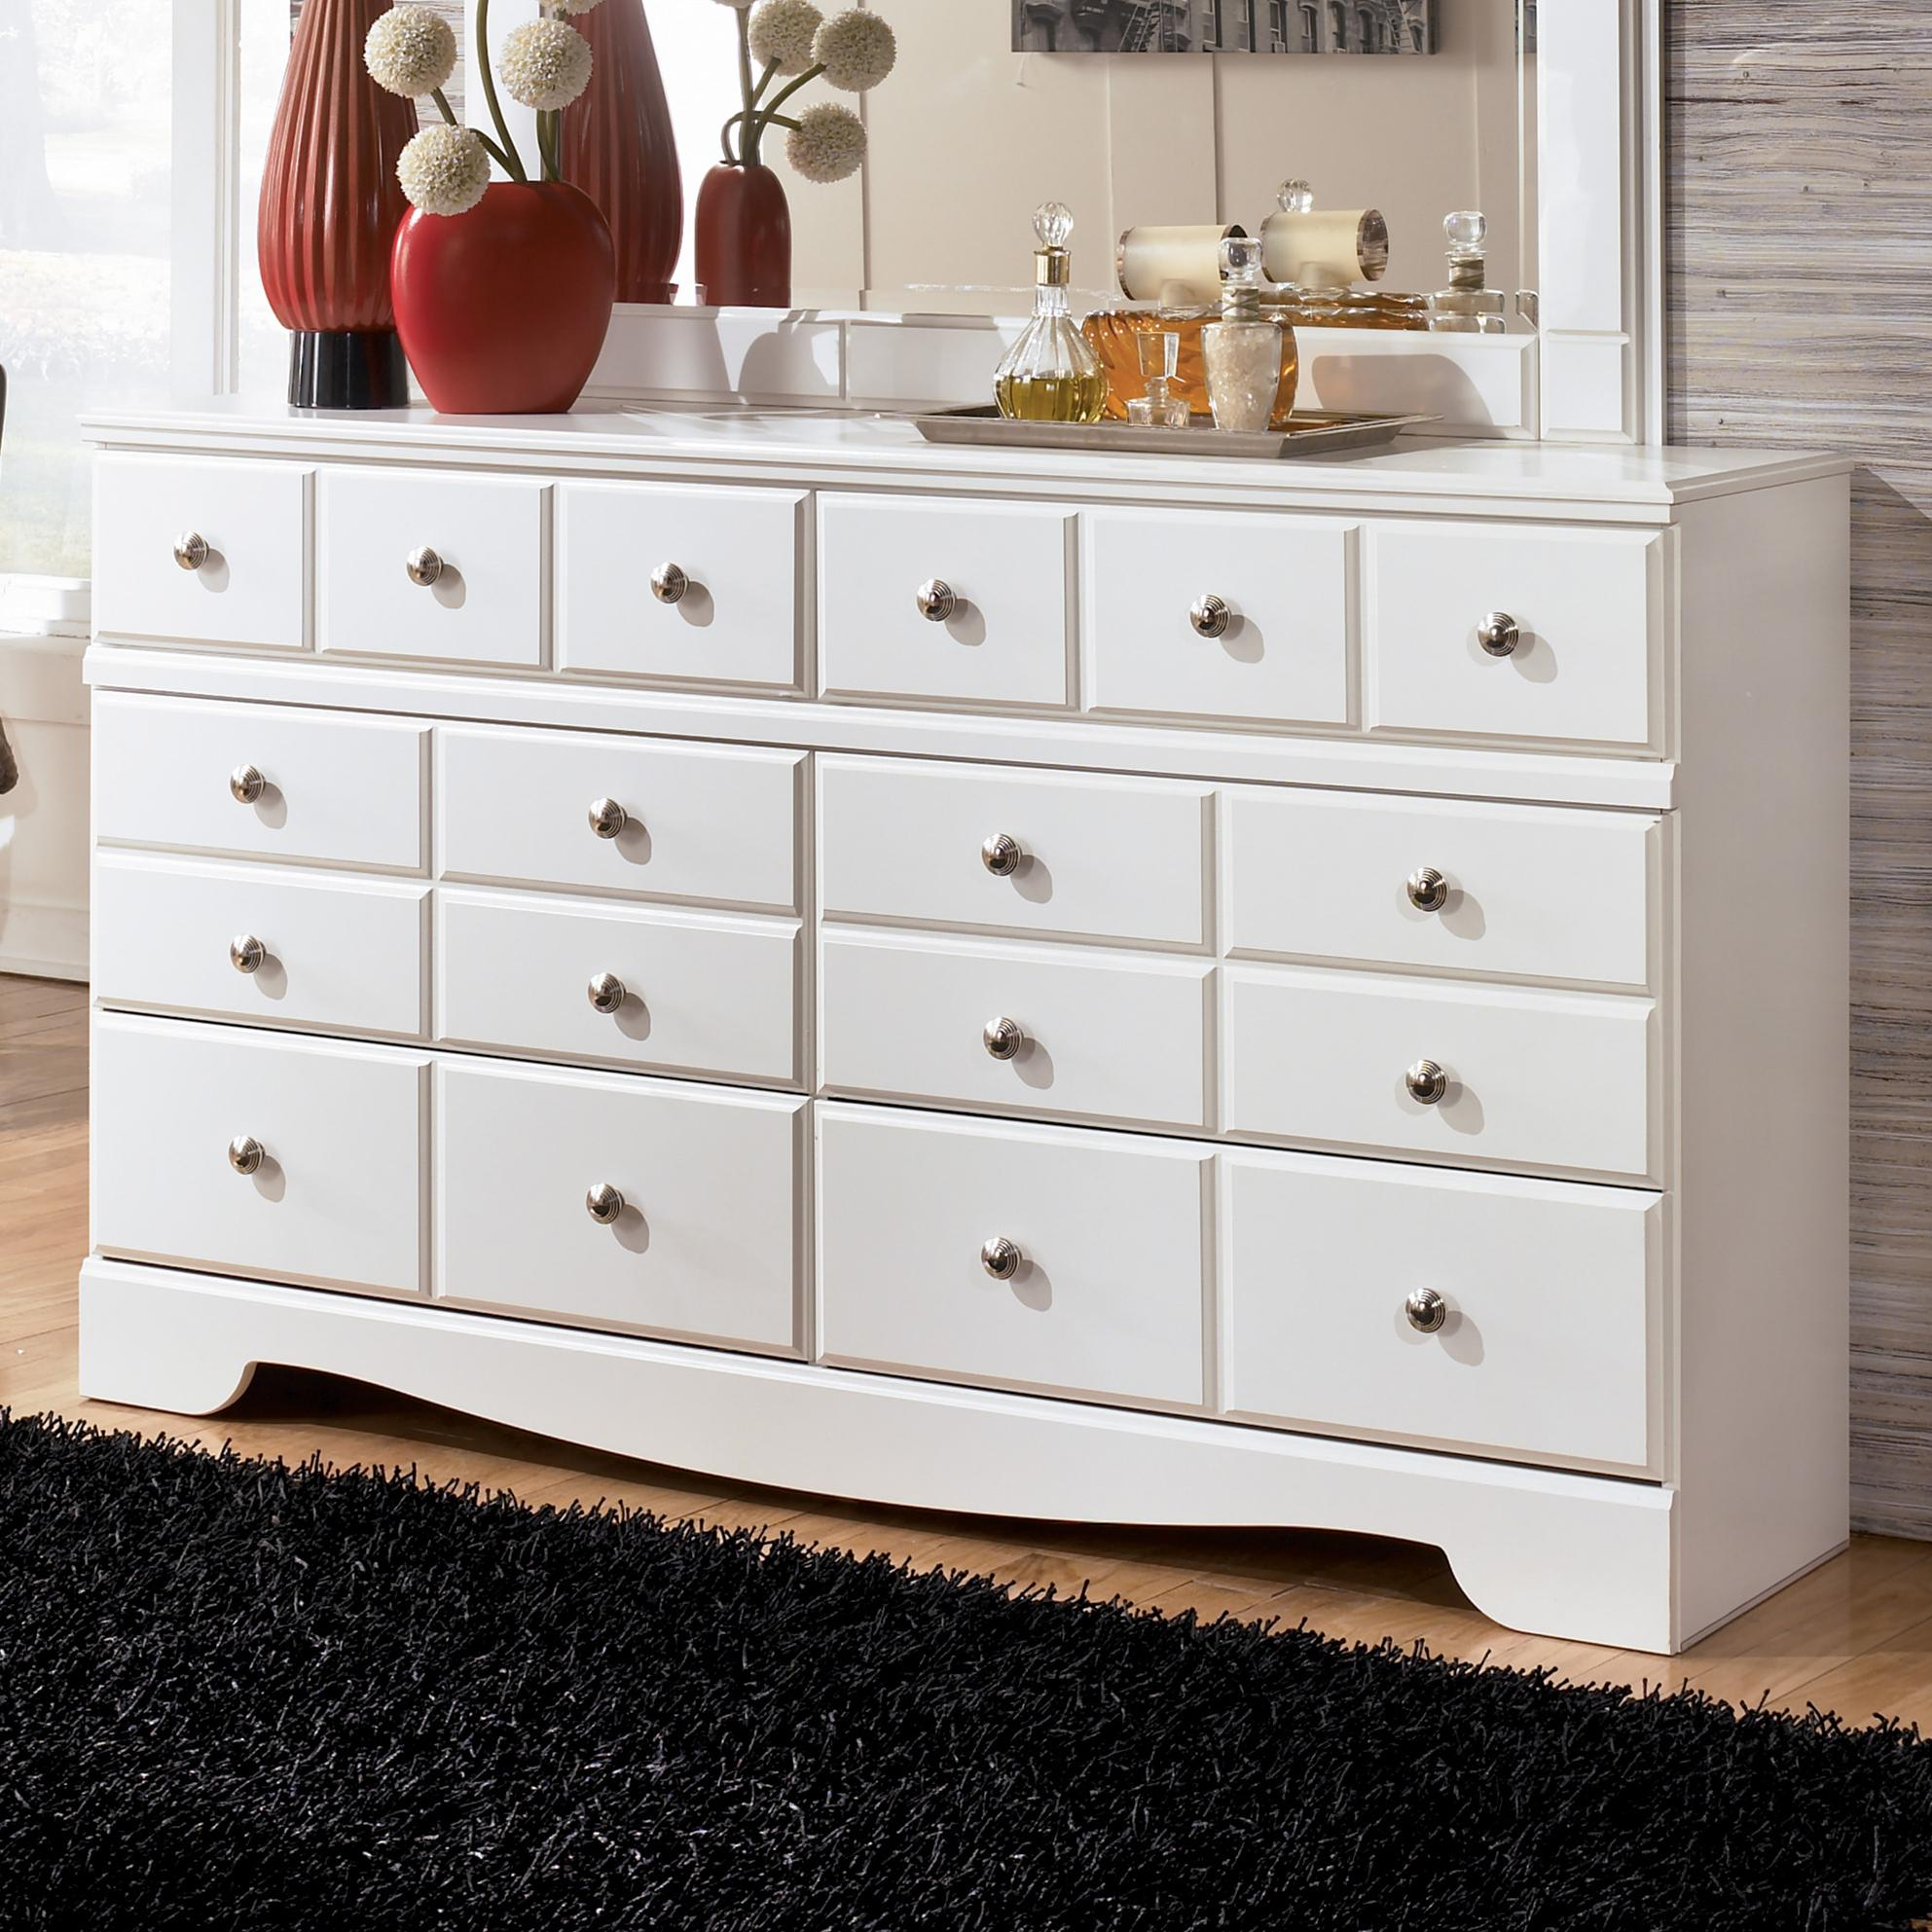 Signature Design by Ashley Weeki 6 Drawer Dresser - Item Number: B270-31